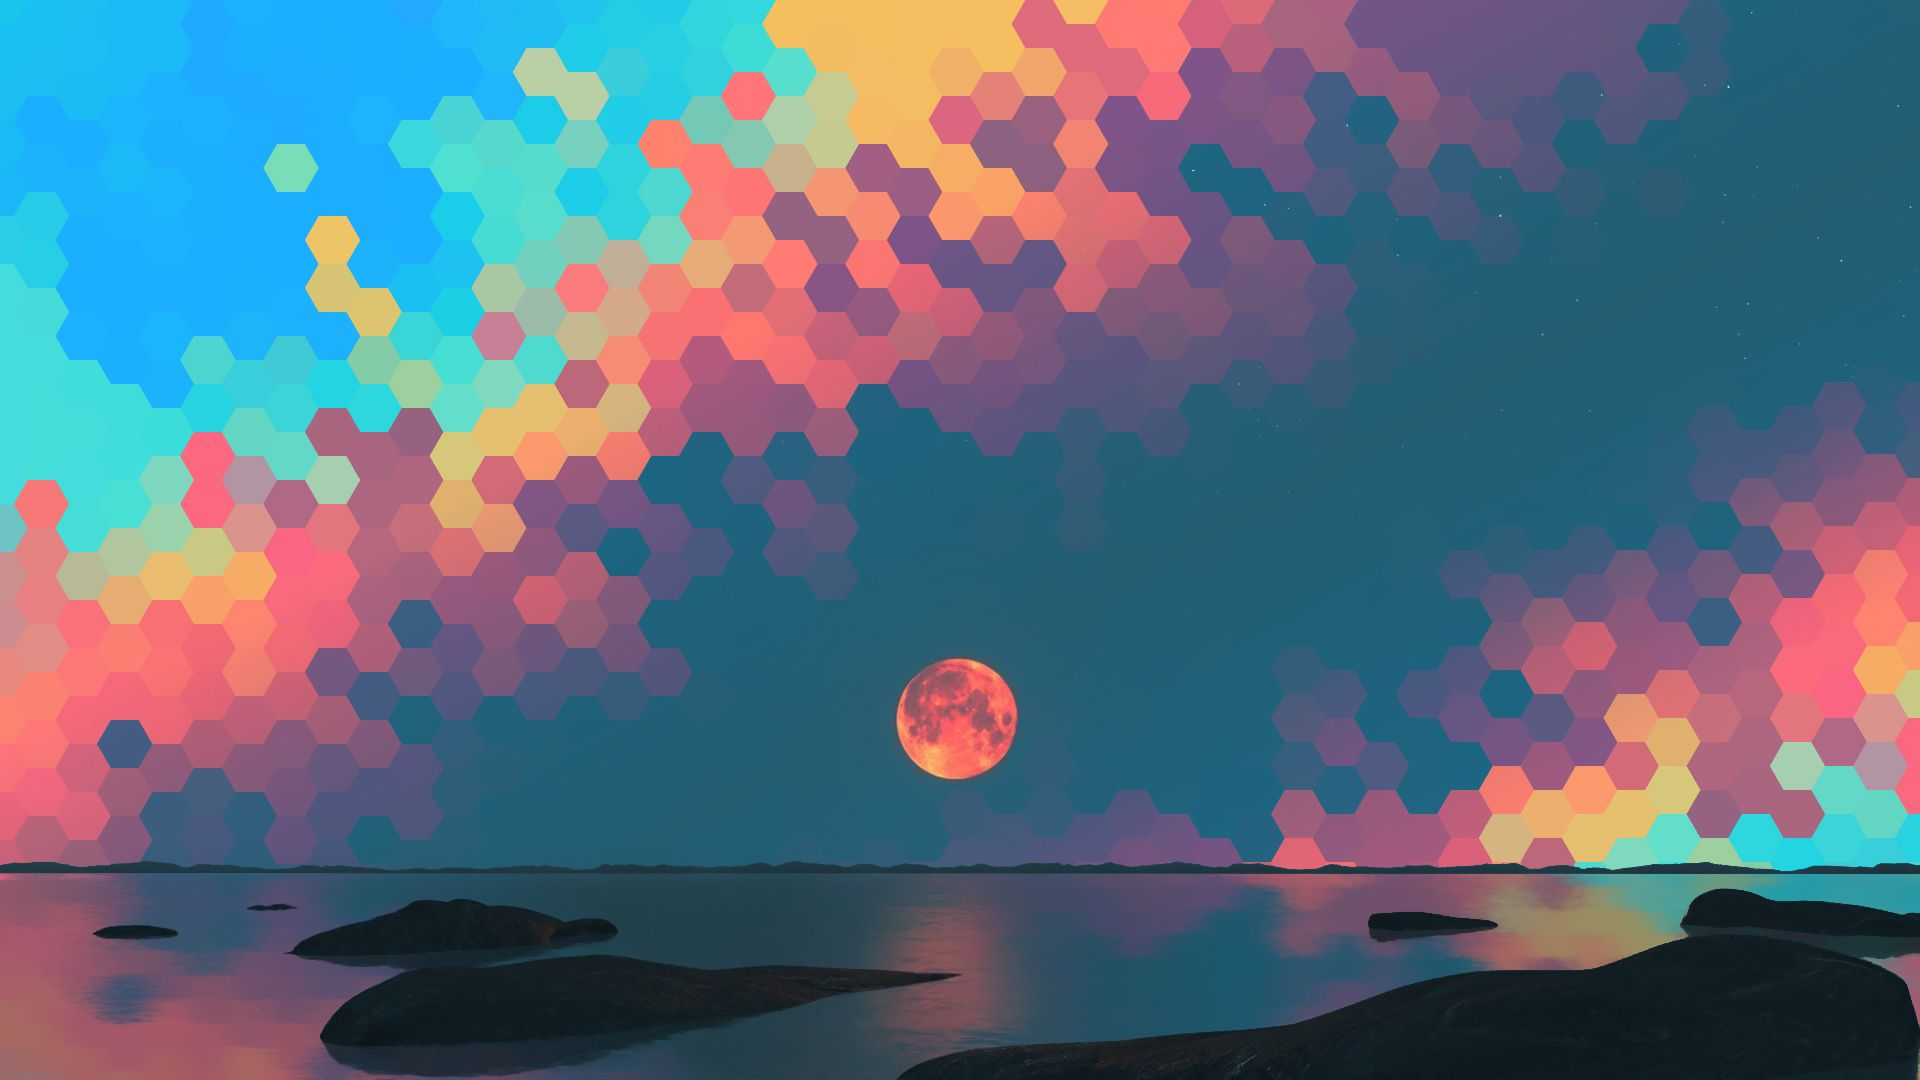 Blood moon (19201080) | Beautiful Wallpaper | Wallpaper ...